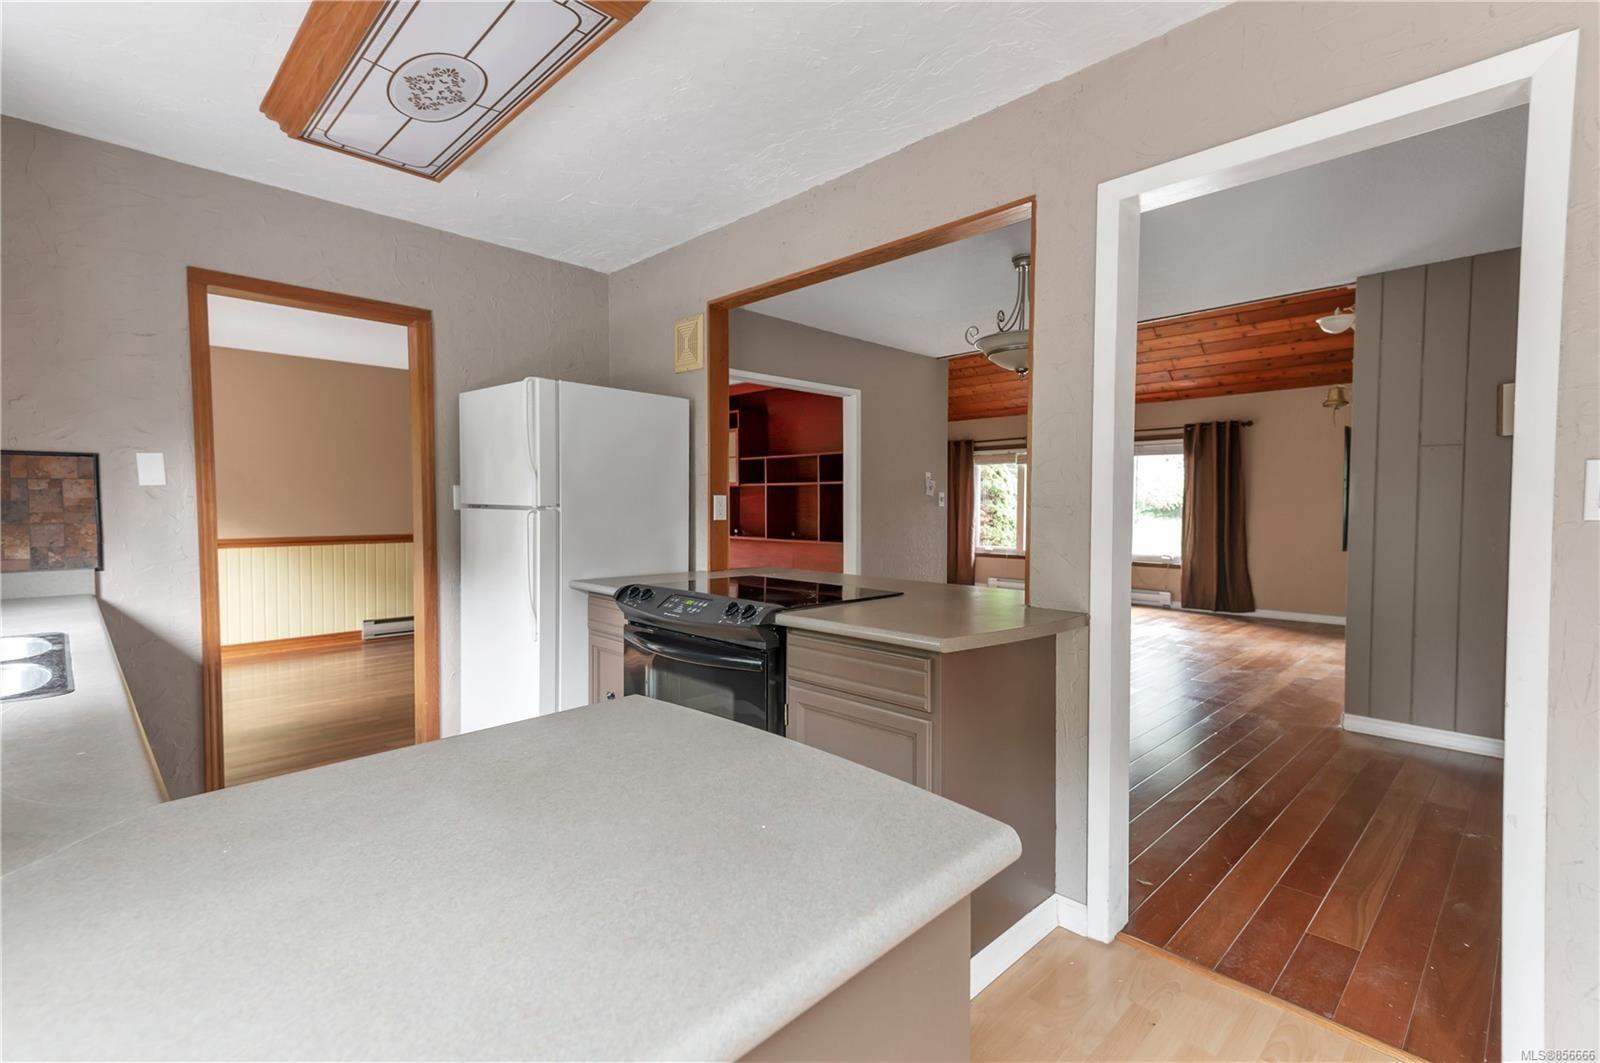 Photo 3: Photos: 2468 Oakes Rd in : CV Merville Black Creek House for sale (Comox Valley)  : MLS®# 856666